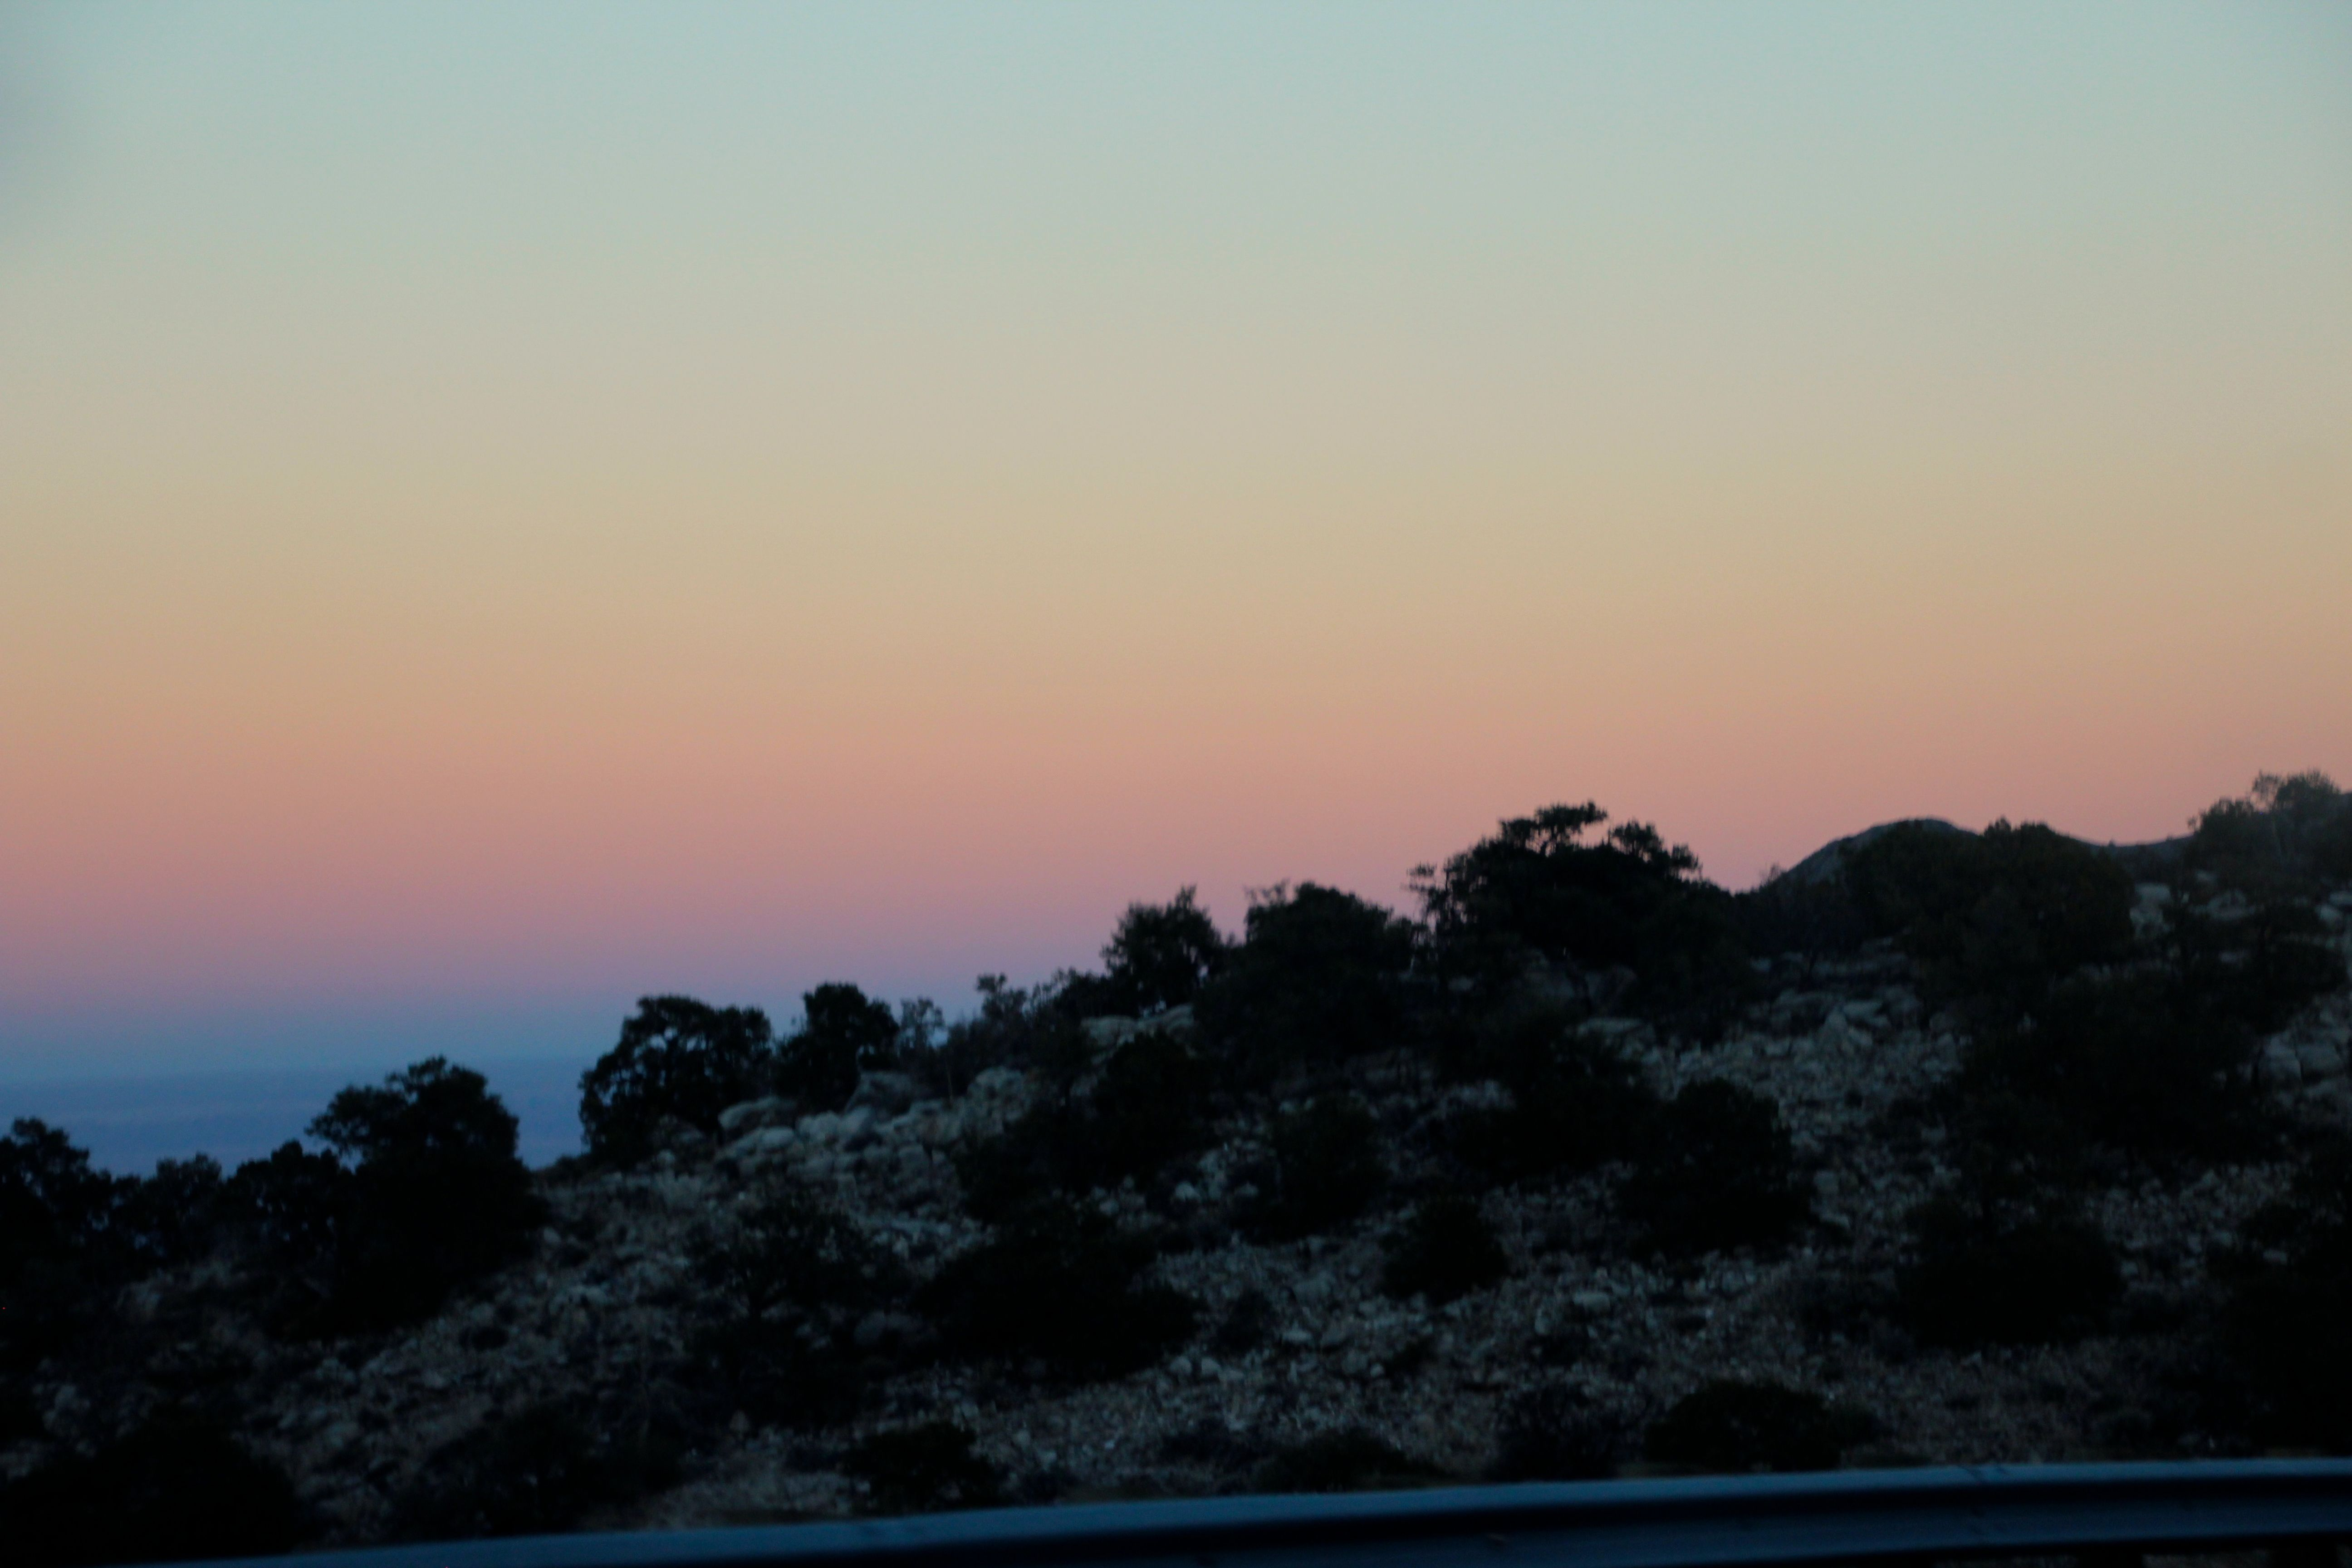 5 road trip sunset usa (c) upupup.fr